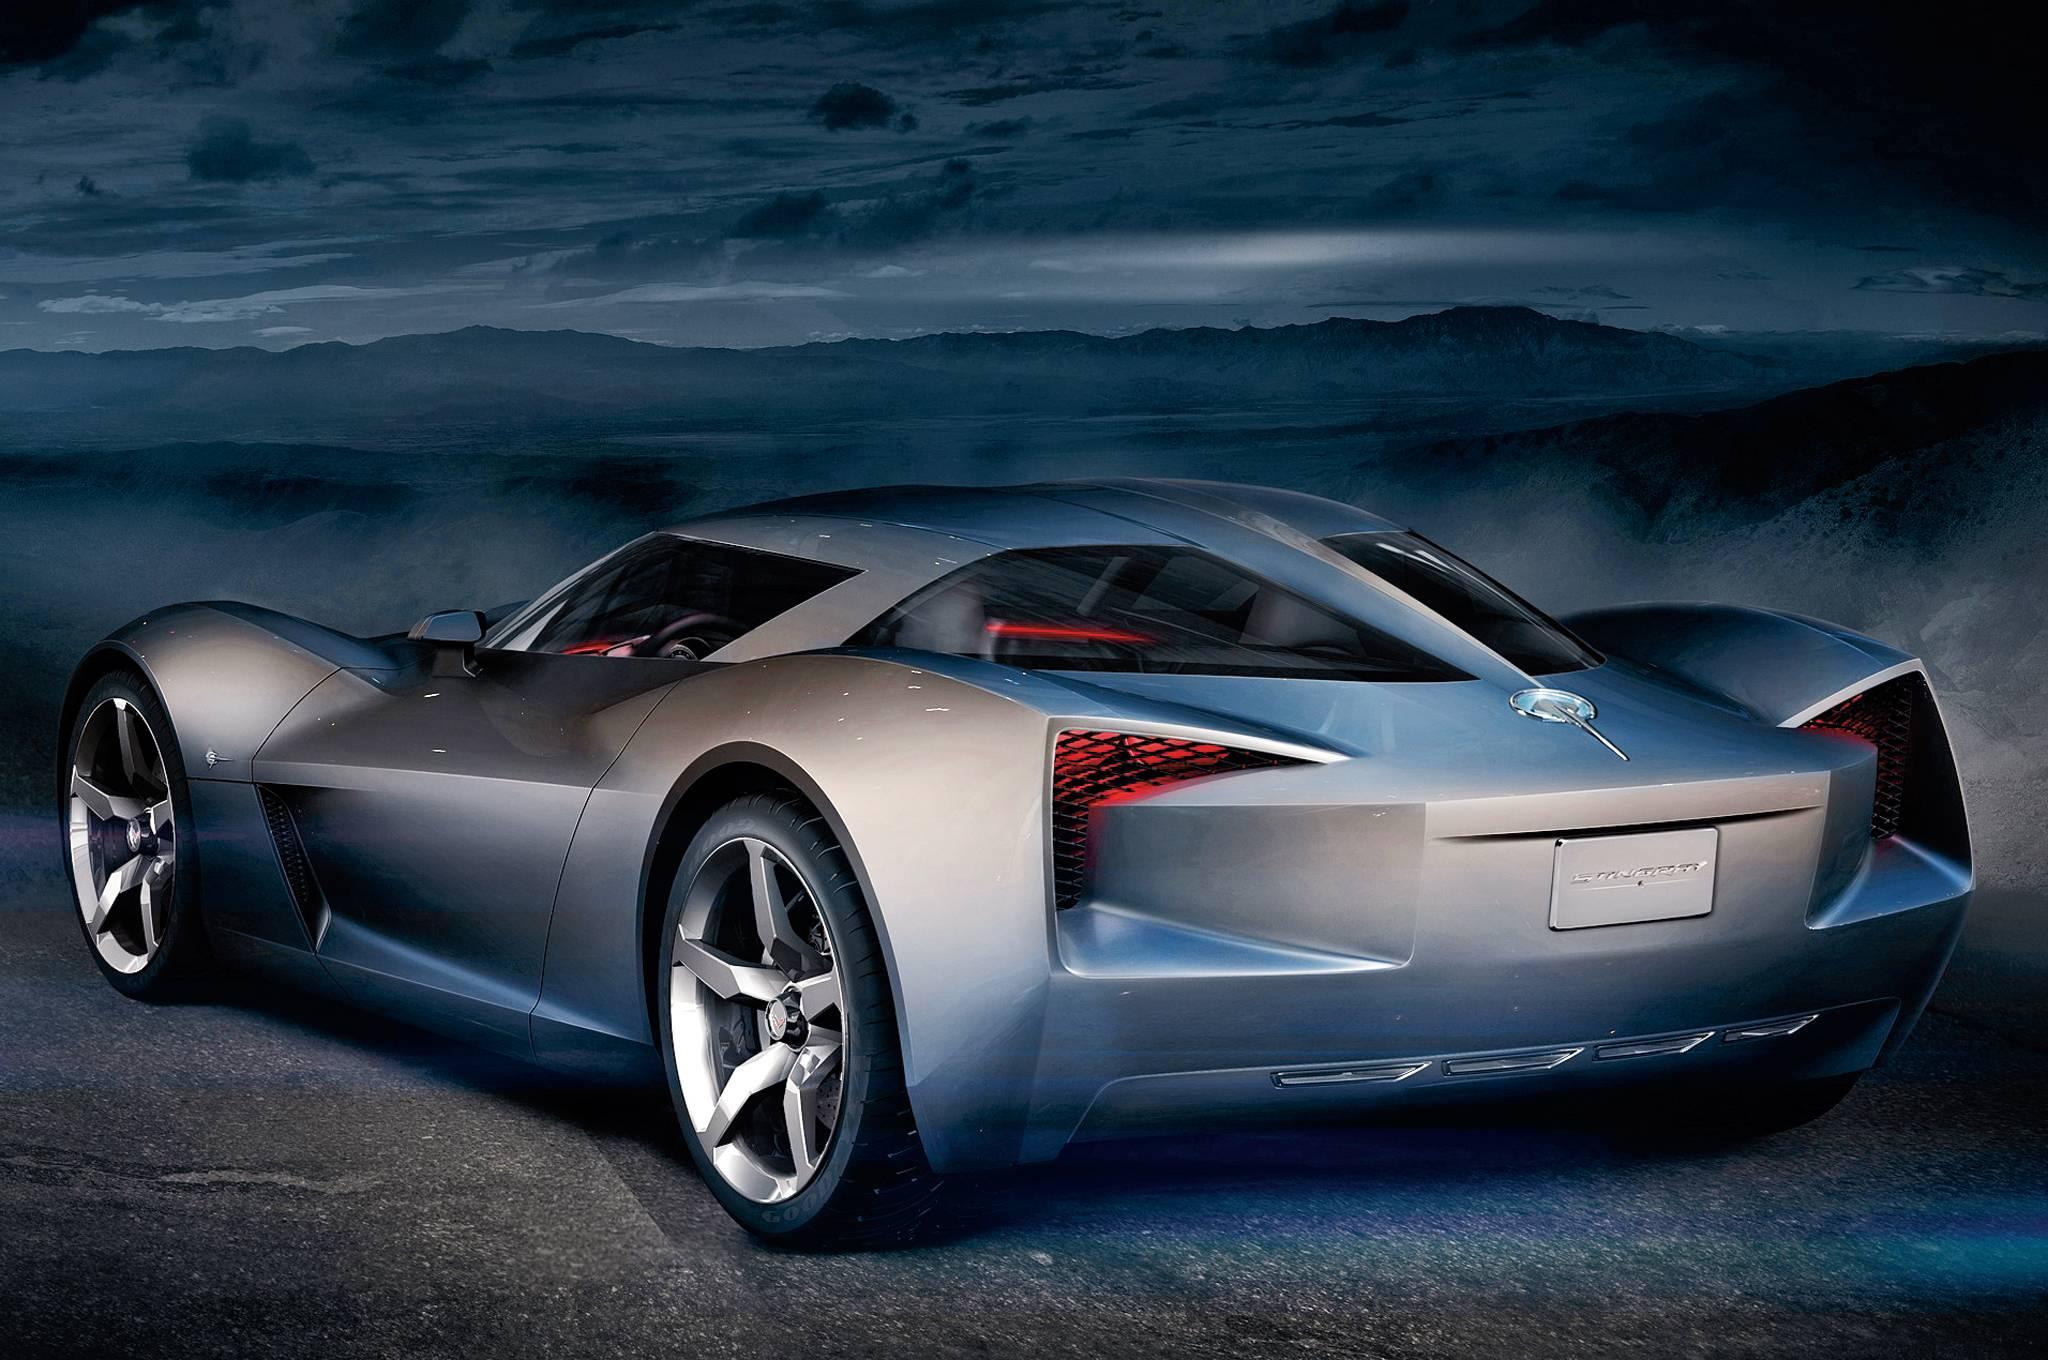 2015 chevrolet corvette stingray concept photo wallpaper 24048 - Corvette 2015 Stingray Blue